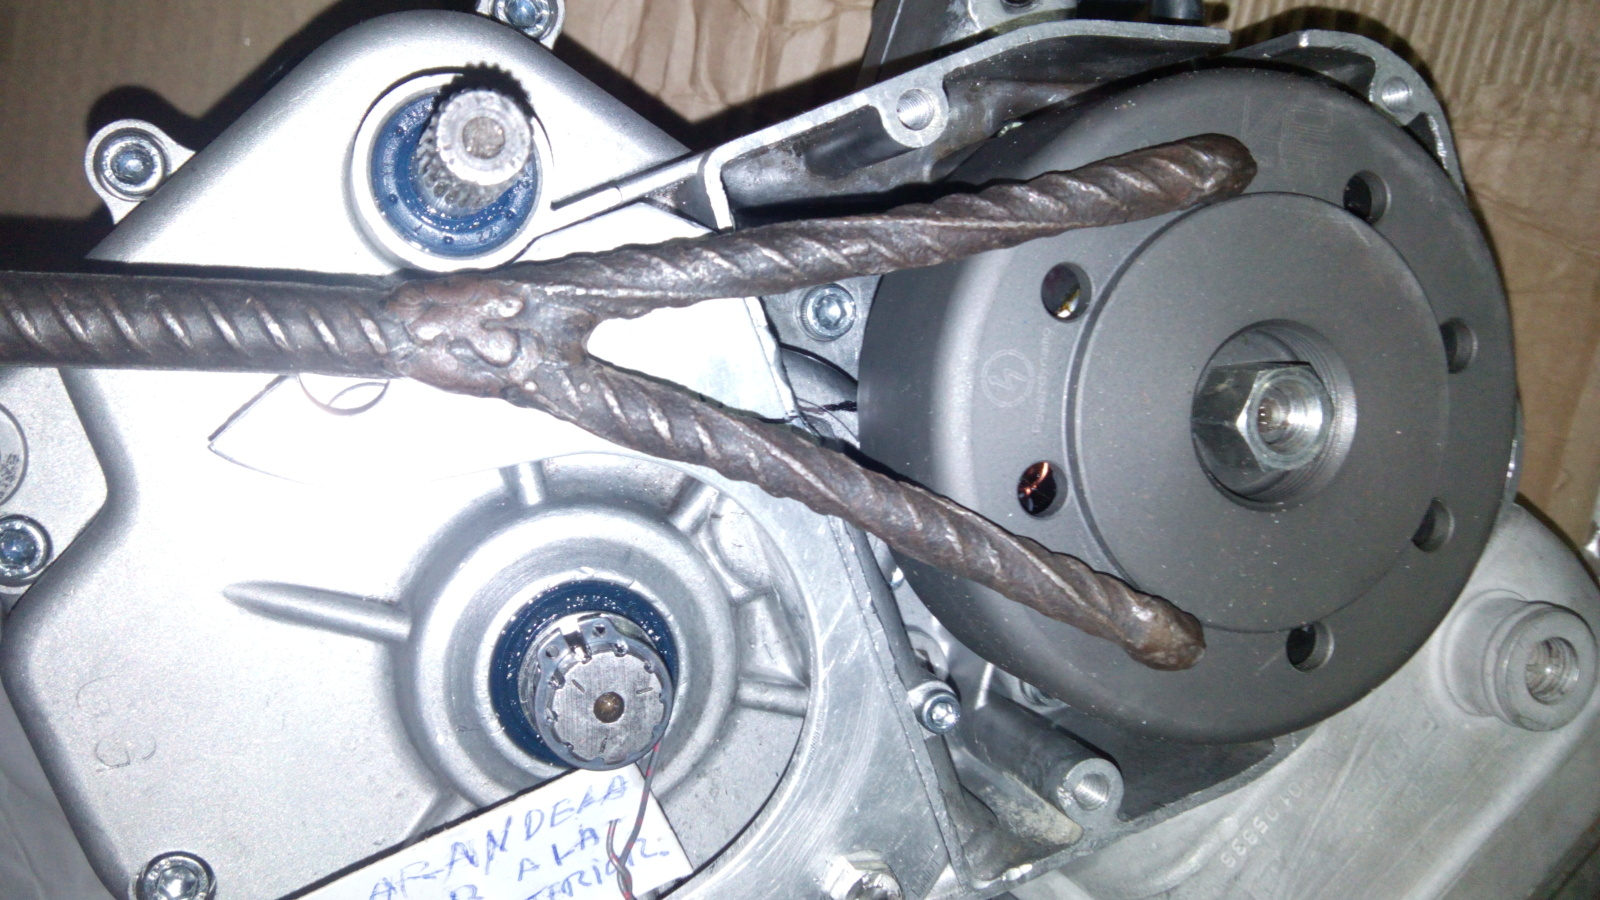 encendido - Mejoras en motores P3 P4 RV4 DL P6 K6... - Página 6 21an22t